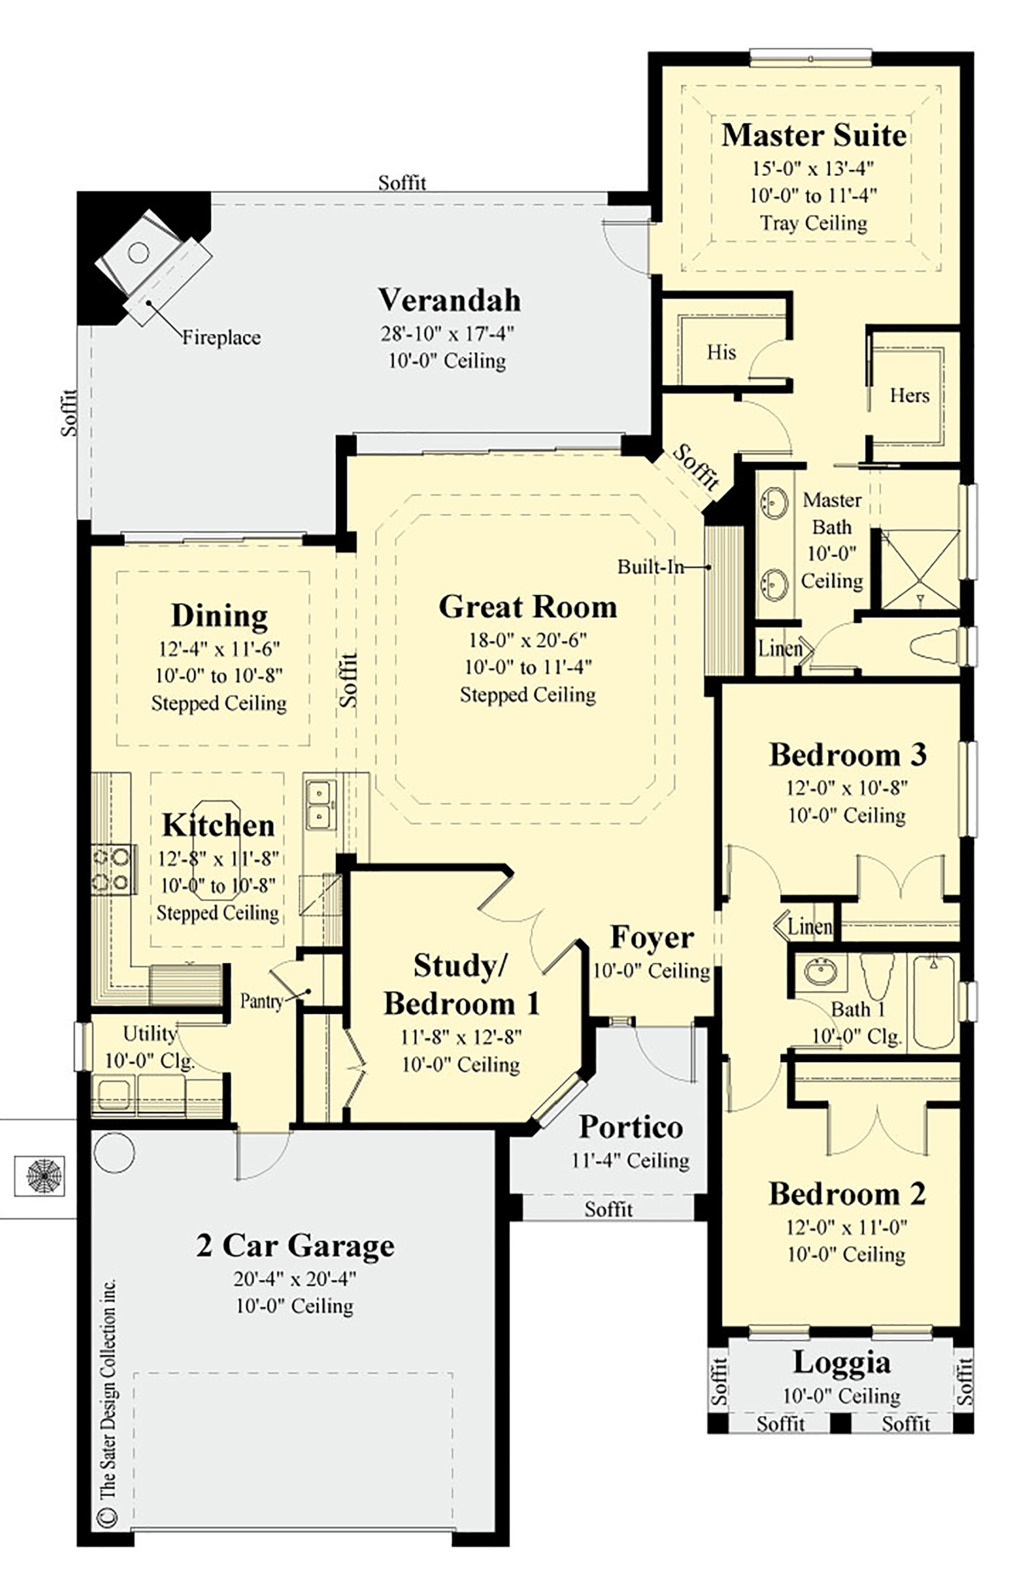 Craftsman Style House Plan 4 Beds 2 Baths 1920 Sq Ft Plan 930 503 Eplans Com